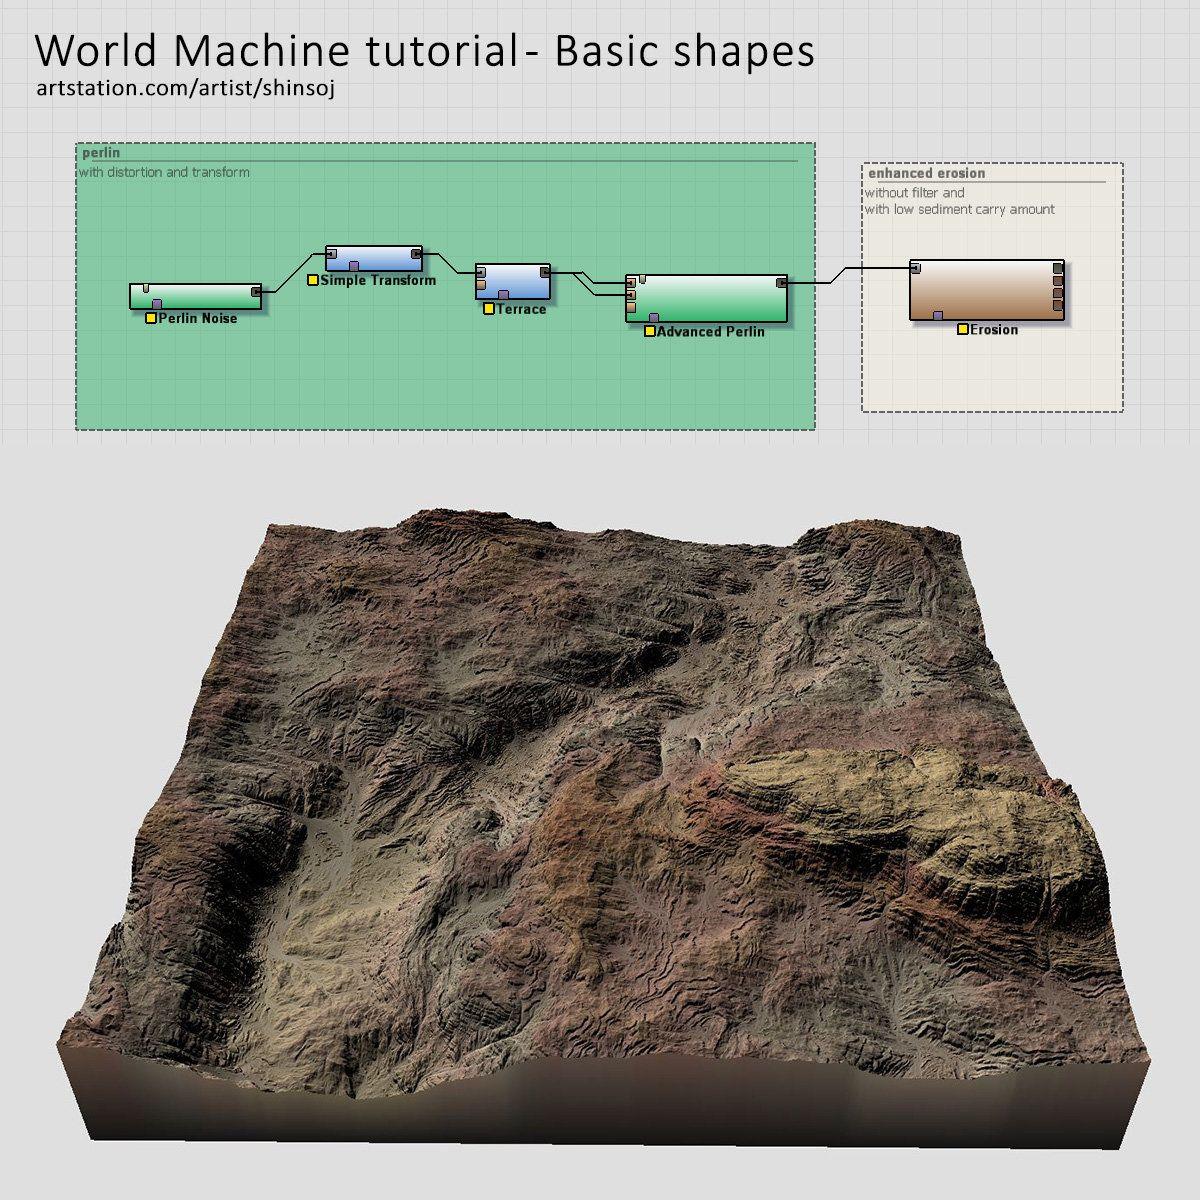 ArtStation - World Machine tutorial - Basic shapes, Iri